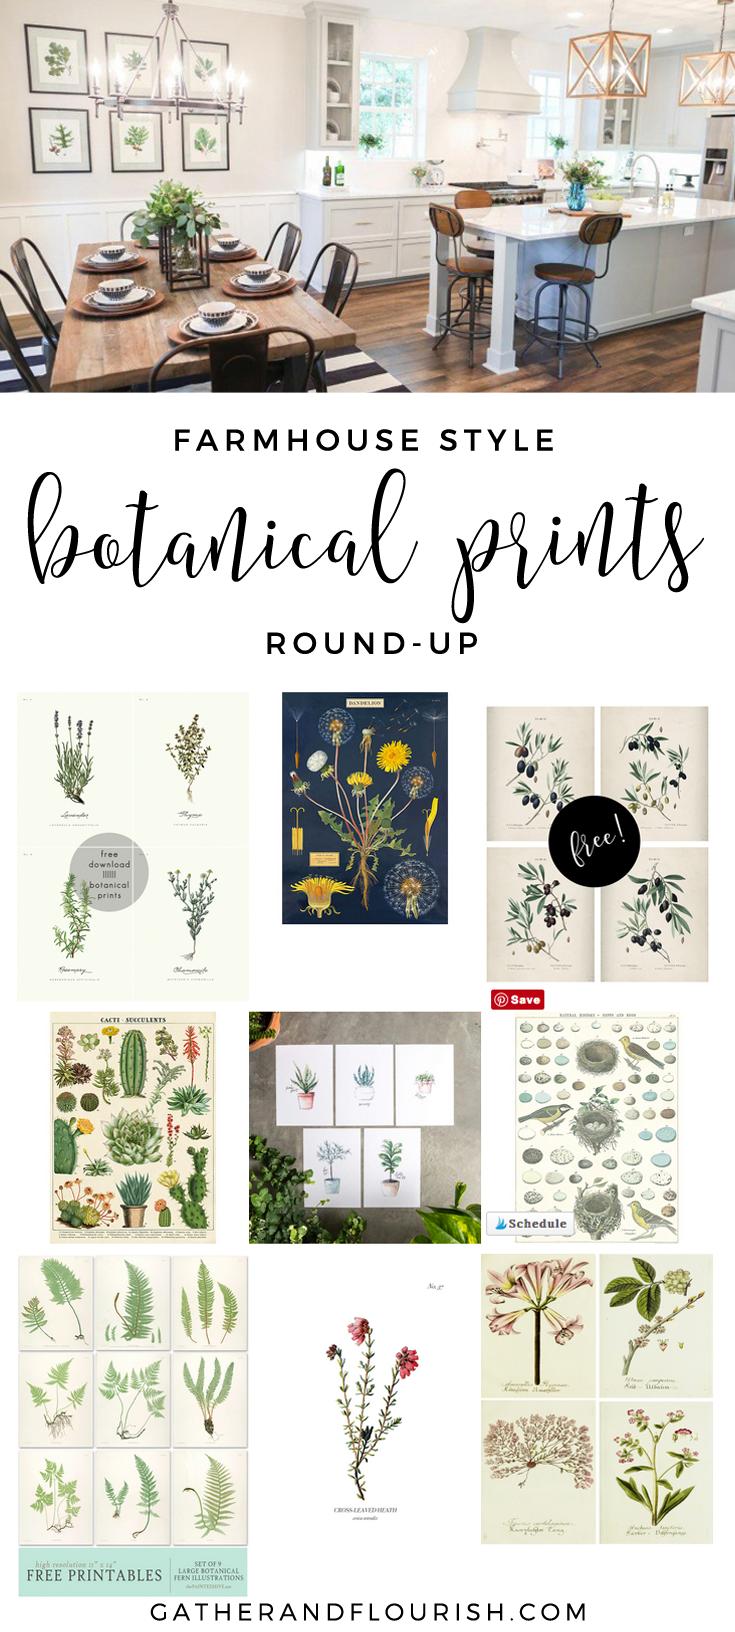 Farmhouse style botanical prints round-up! Free and budget-friendly farmhouse style botanical prints!